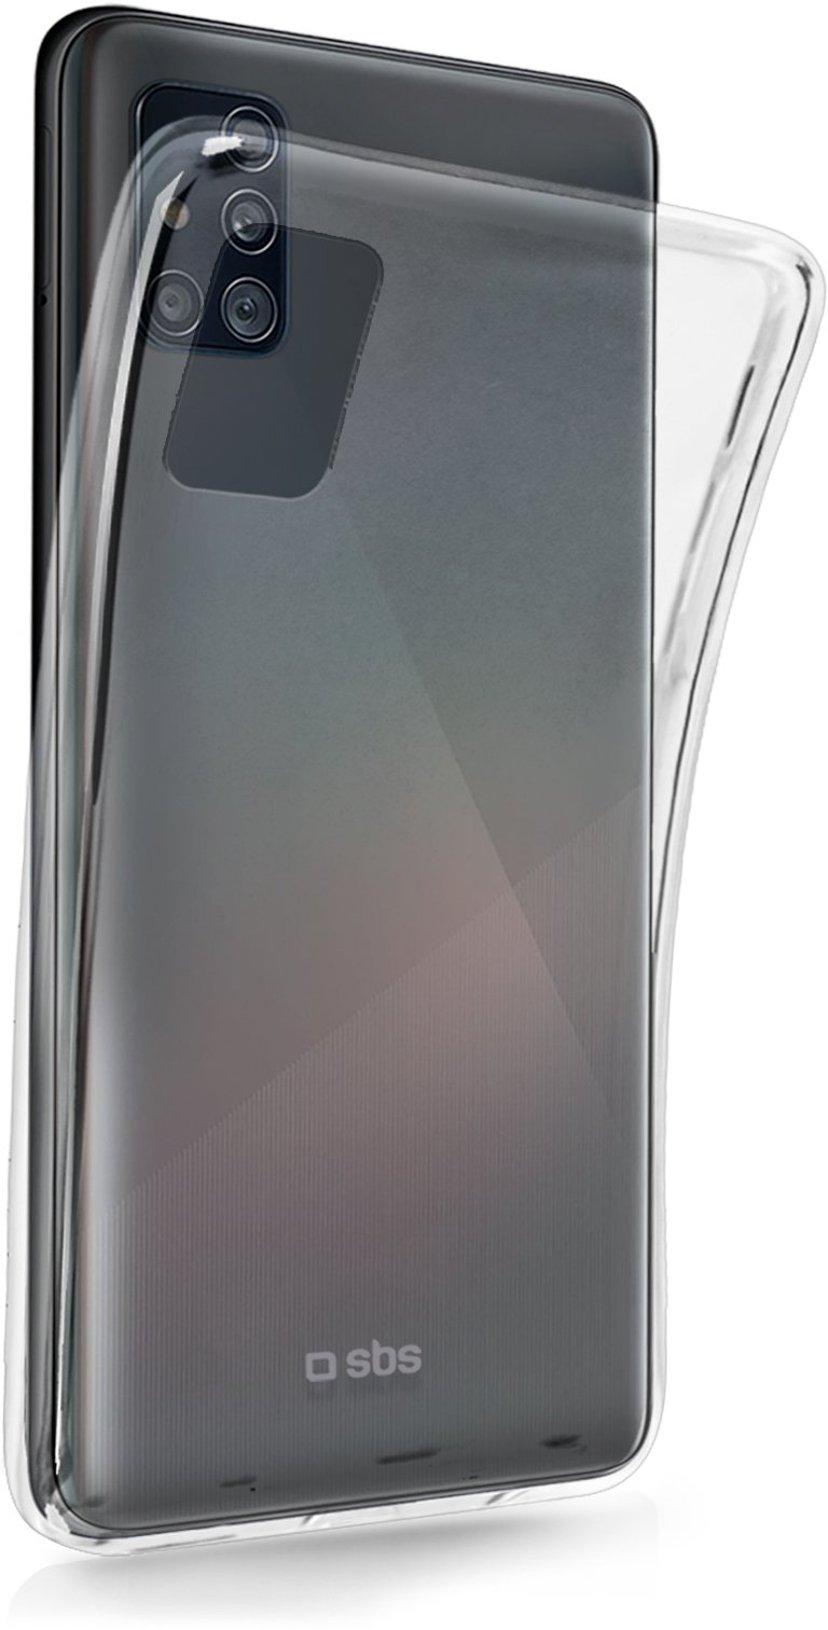 sbs Skinny Cover Samsung Galaxy A52, Samsung Galaxy A52s Transparent